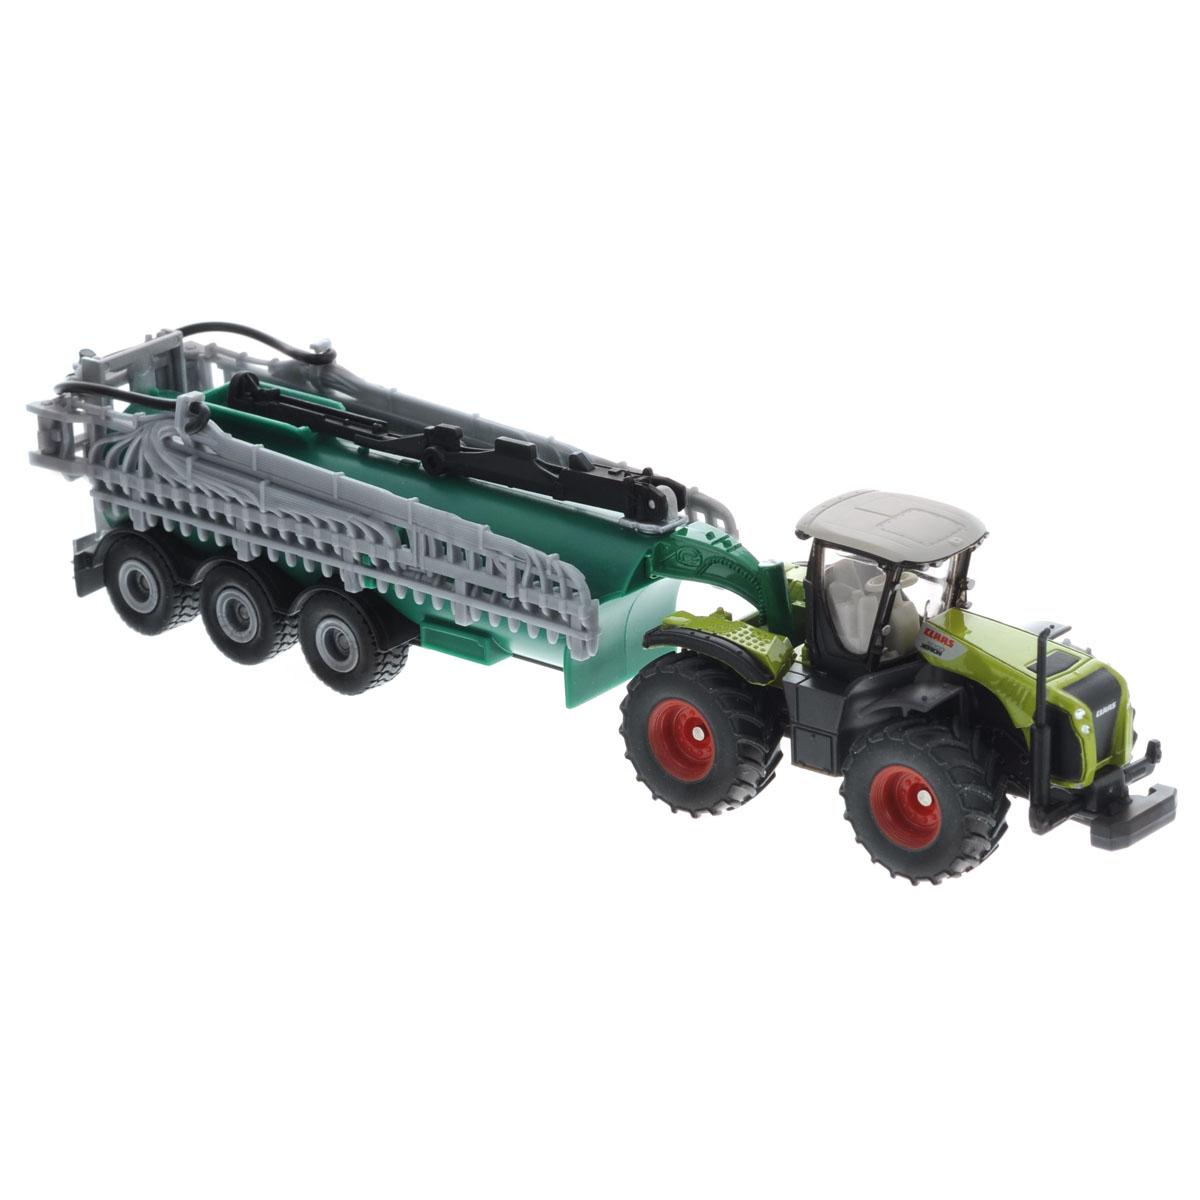 Siku Трактор Claas Xerion с вакуумным баком Samson siku трактор claas с прицепом oehler